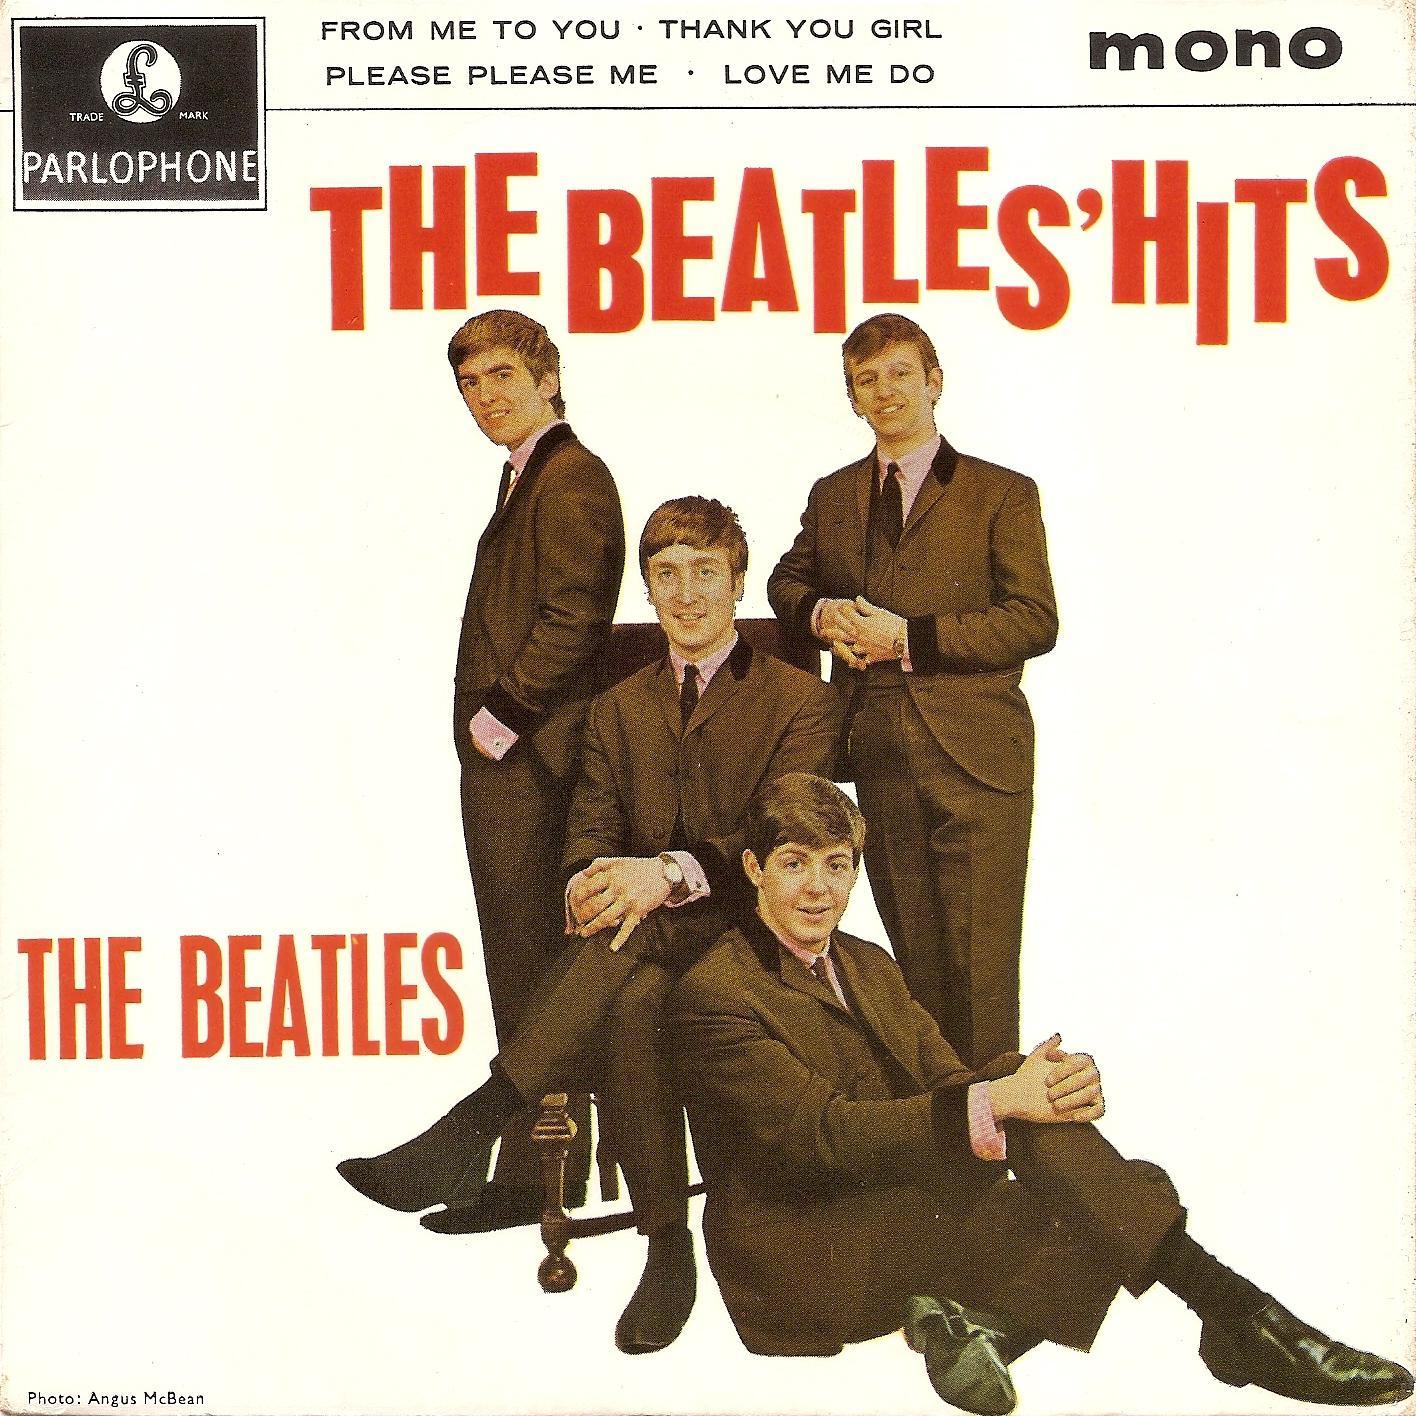 Comprehensive Beatles 1962 November 26 Sources Please